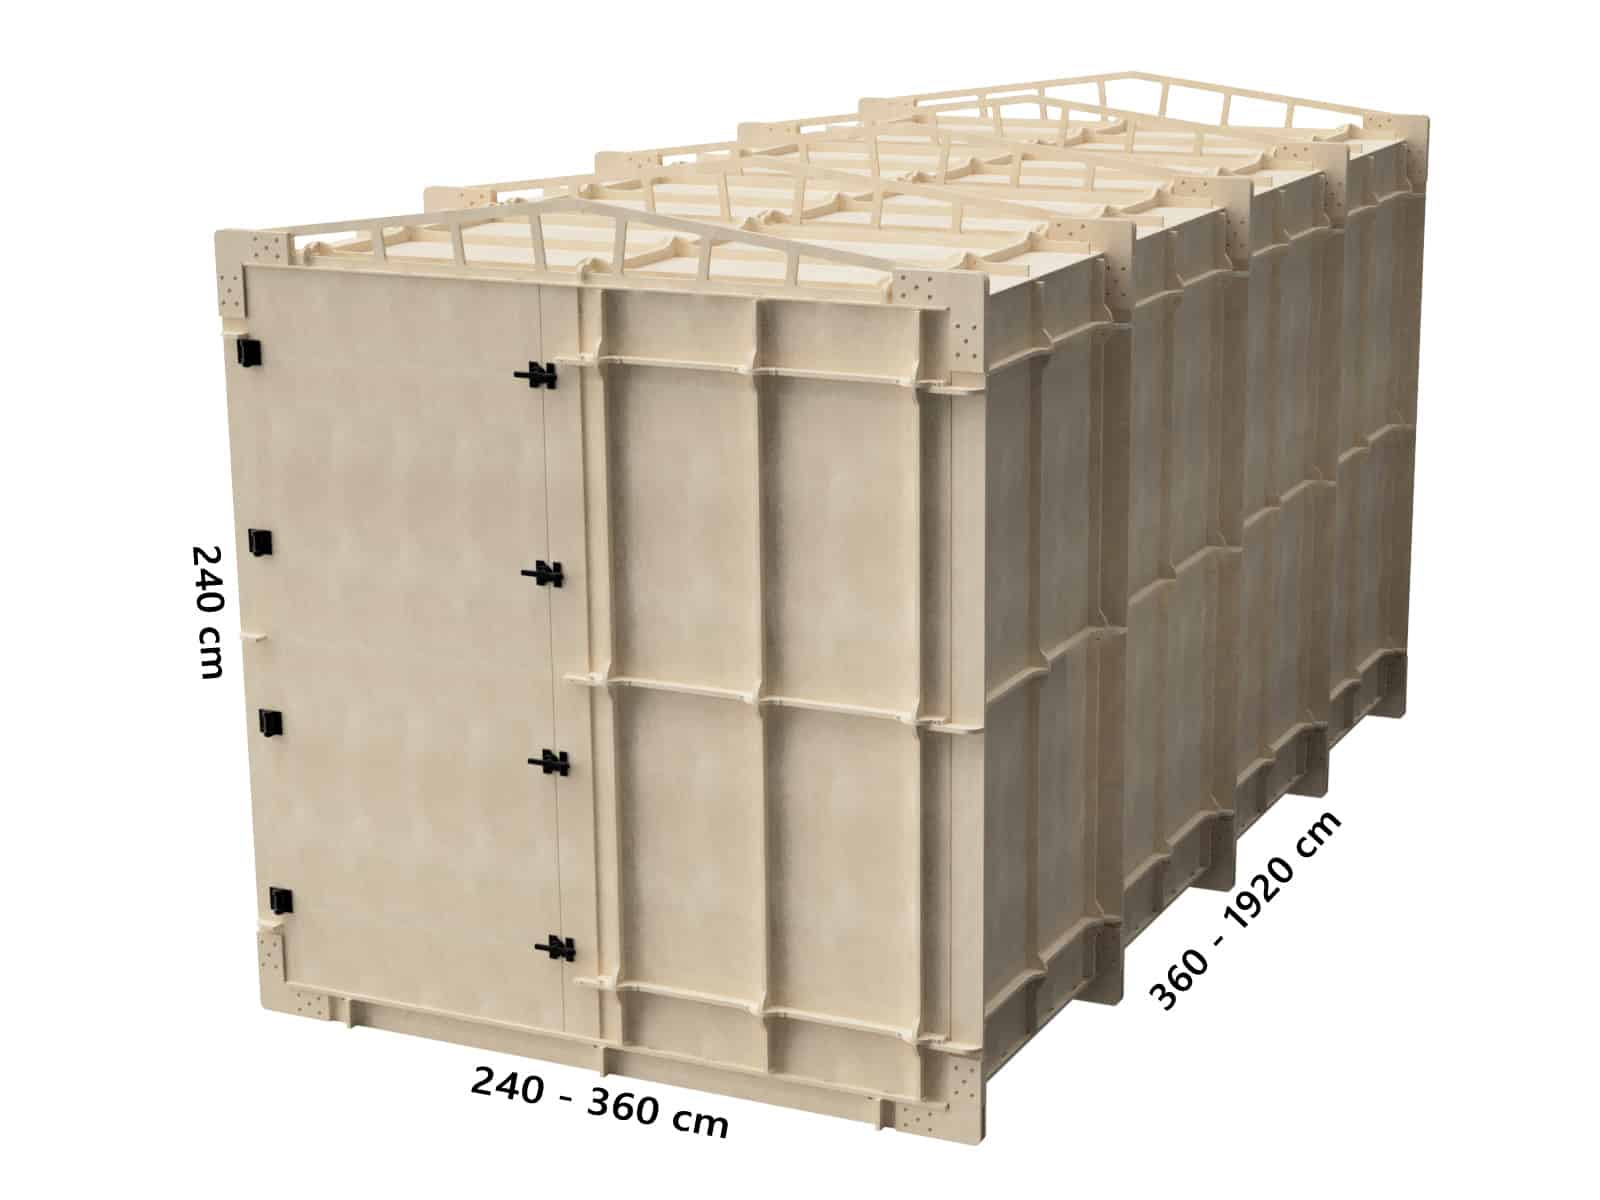 Modular mmWave antenna test range for automotive radar and 5G